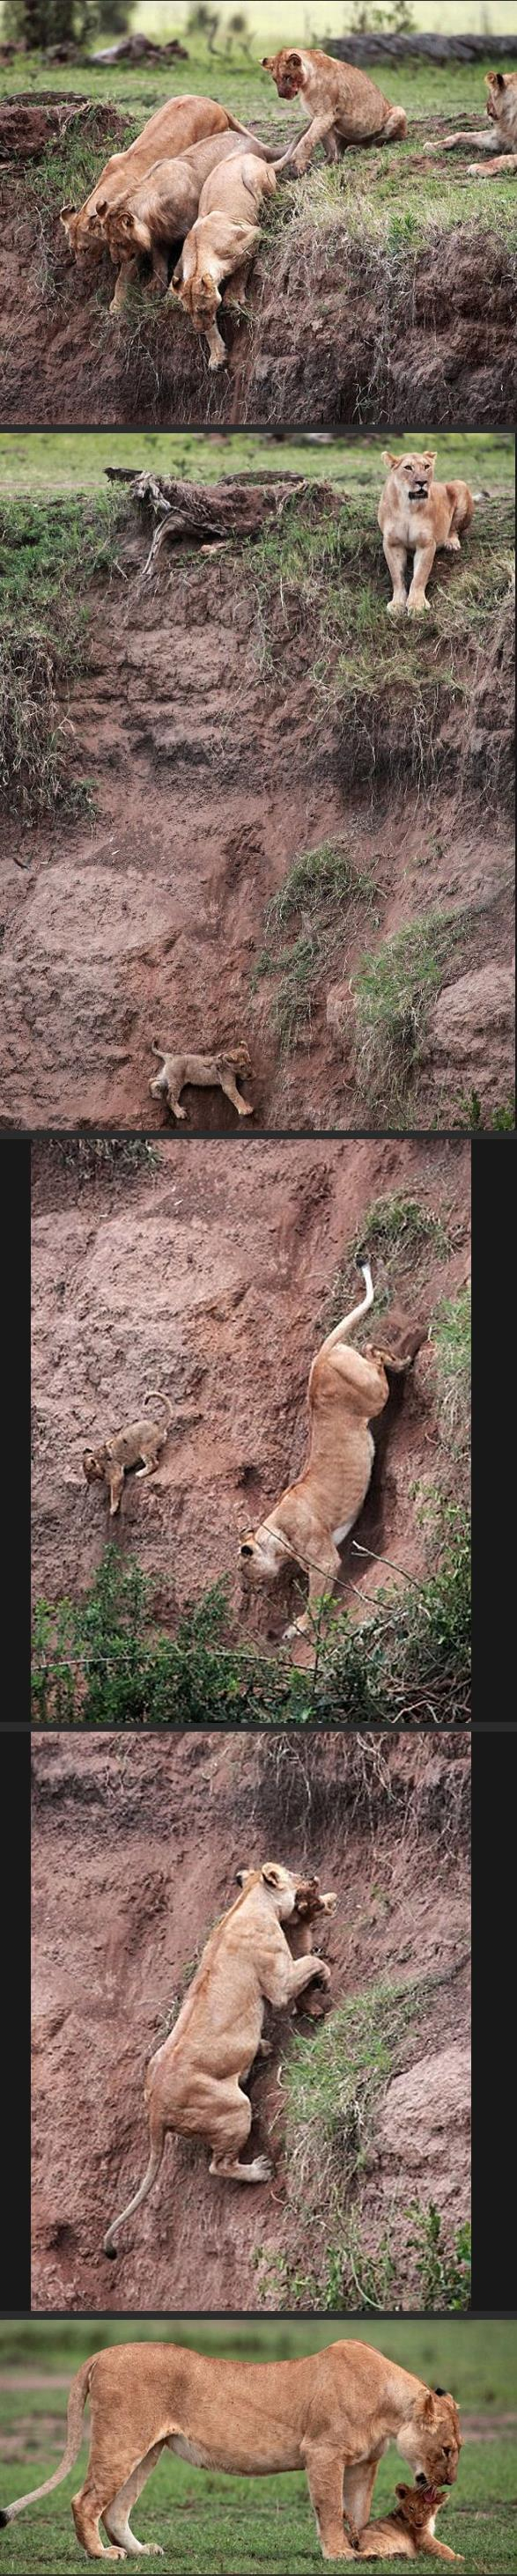 best-viral-pictures-lion-cub-rescue